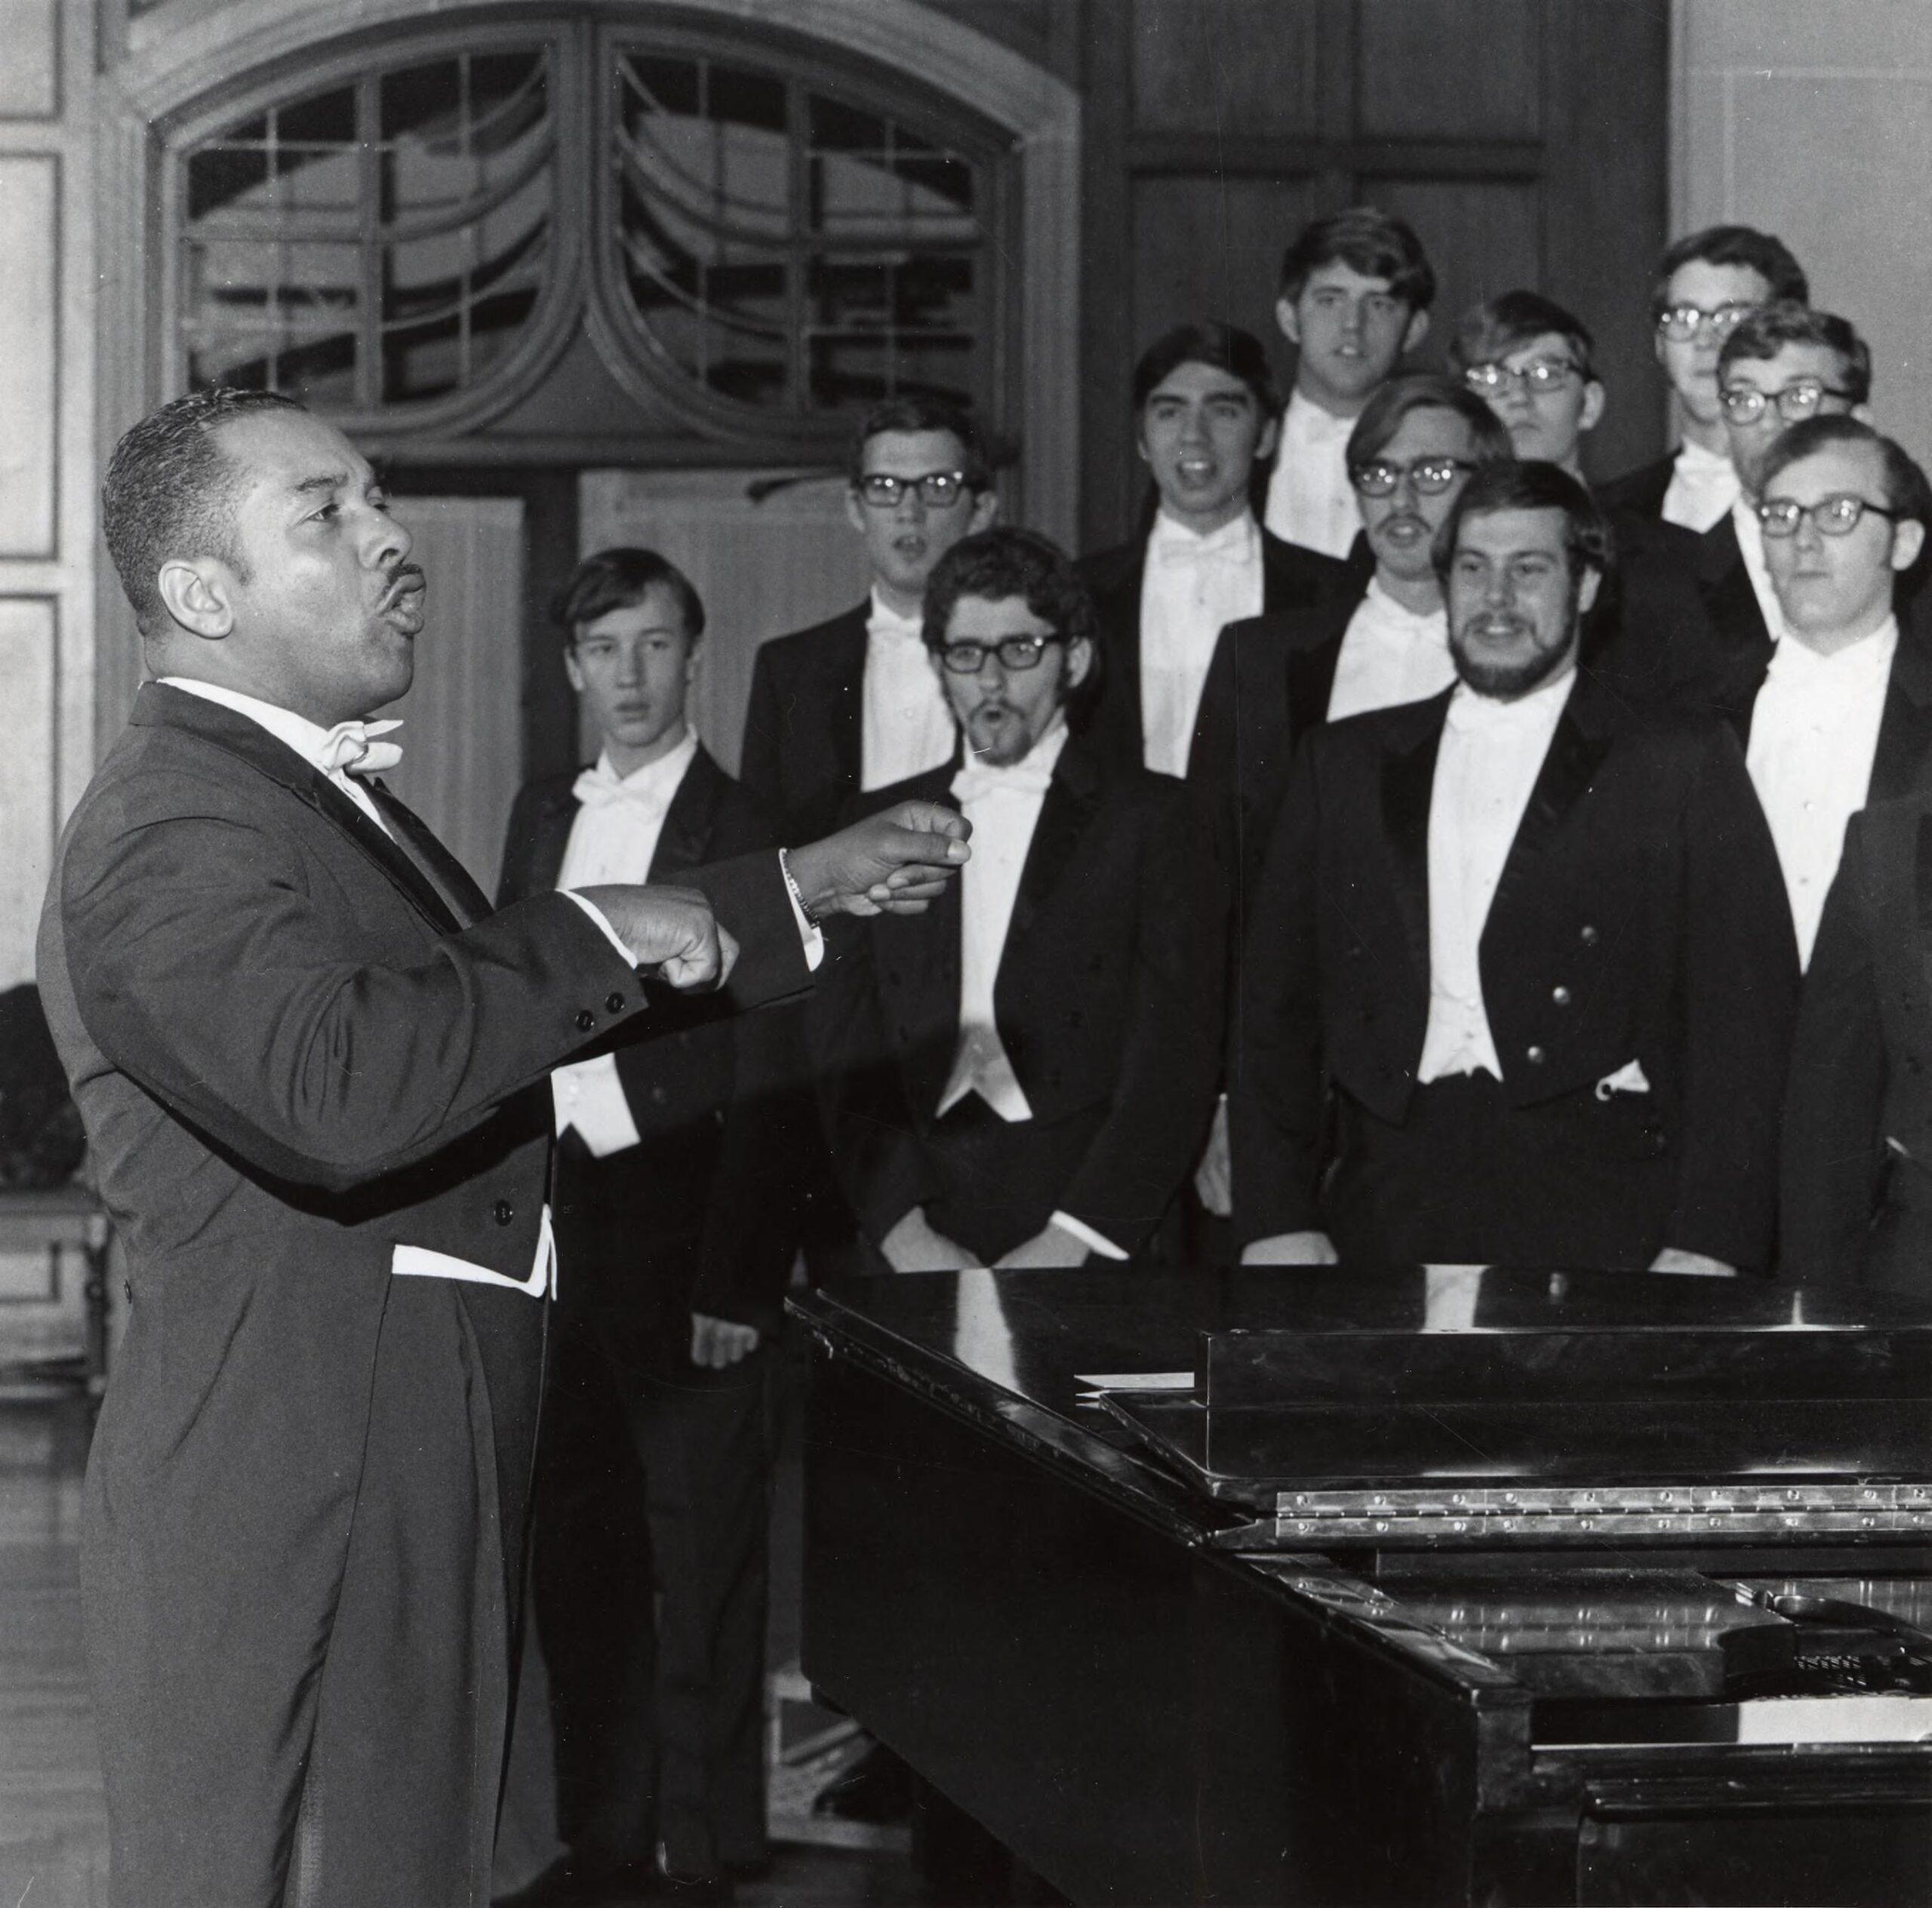 Willis Patterson, professor emeritus, University of Michigan School of Music, Theatre & Dance, conducts the Michigan Men's Glee Club, 1970. Image credit: the U-M Bentley Historical Library.